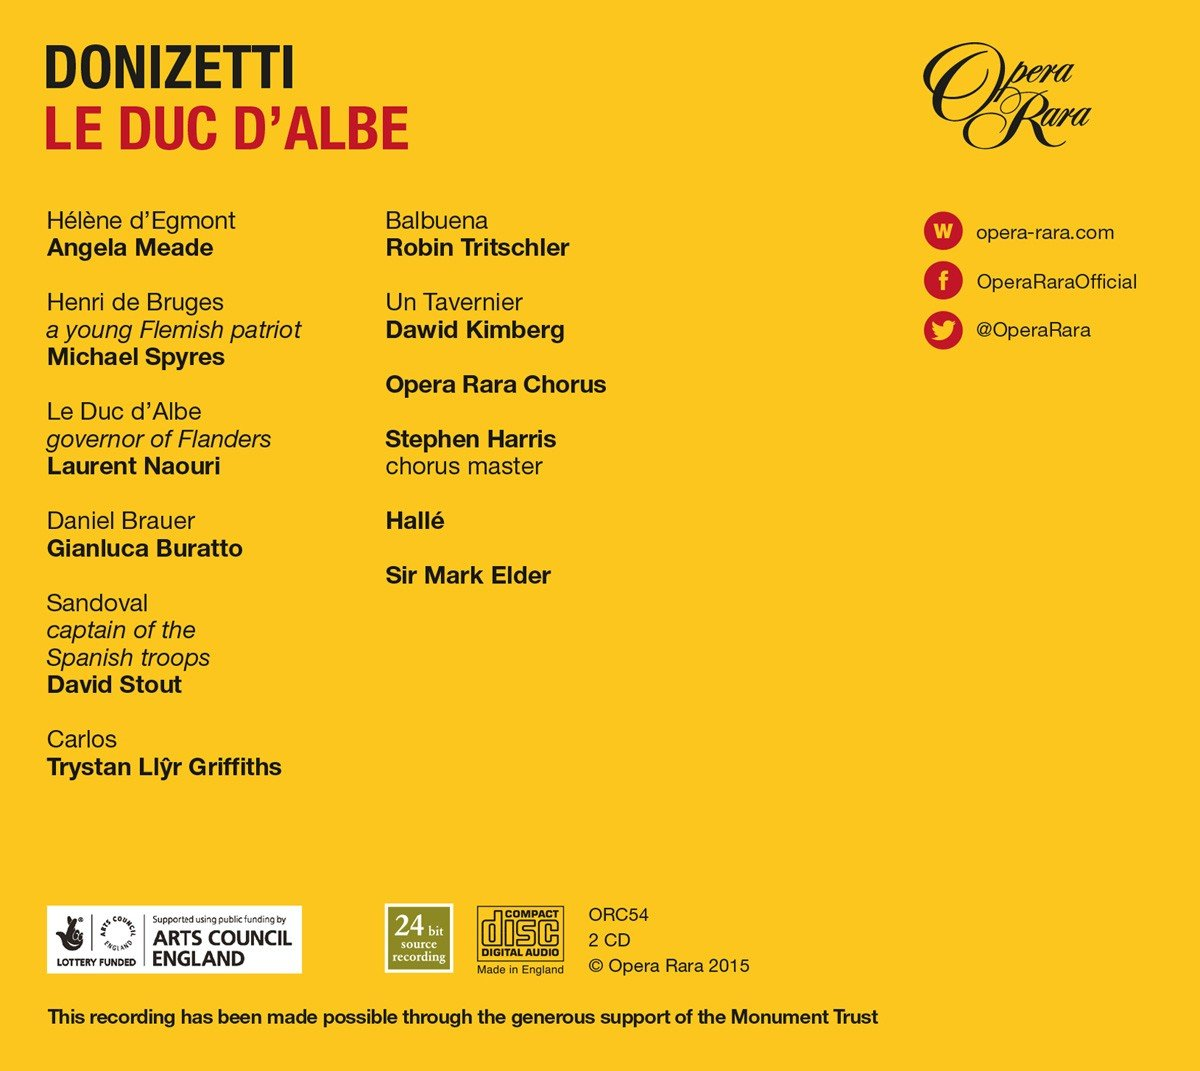 Donizetti - zautres zopéras - Page 7 71i6qNSHXIL._SL1200_